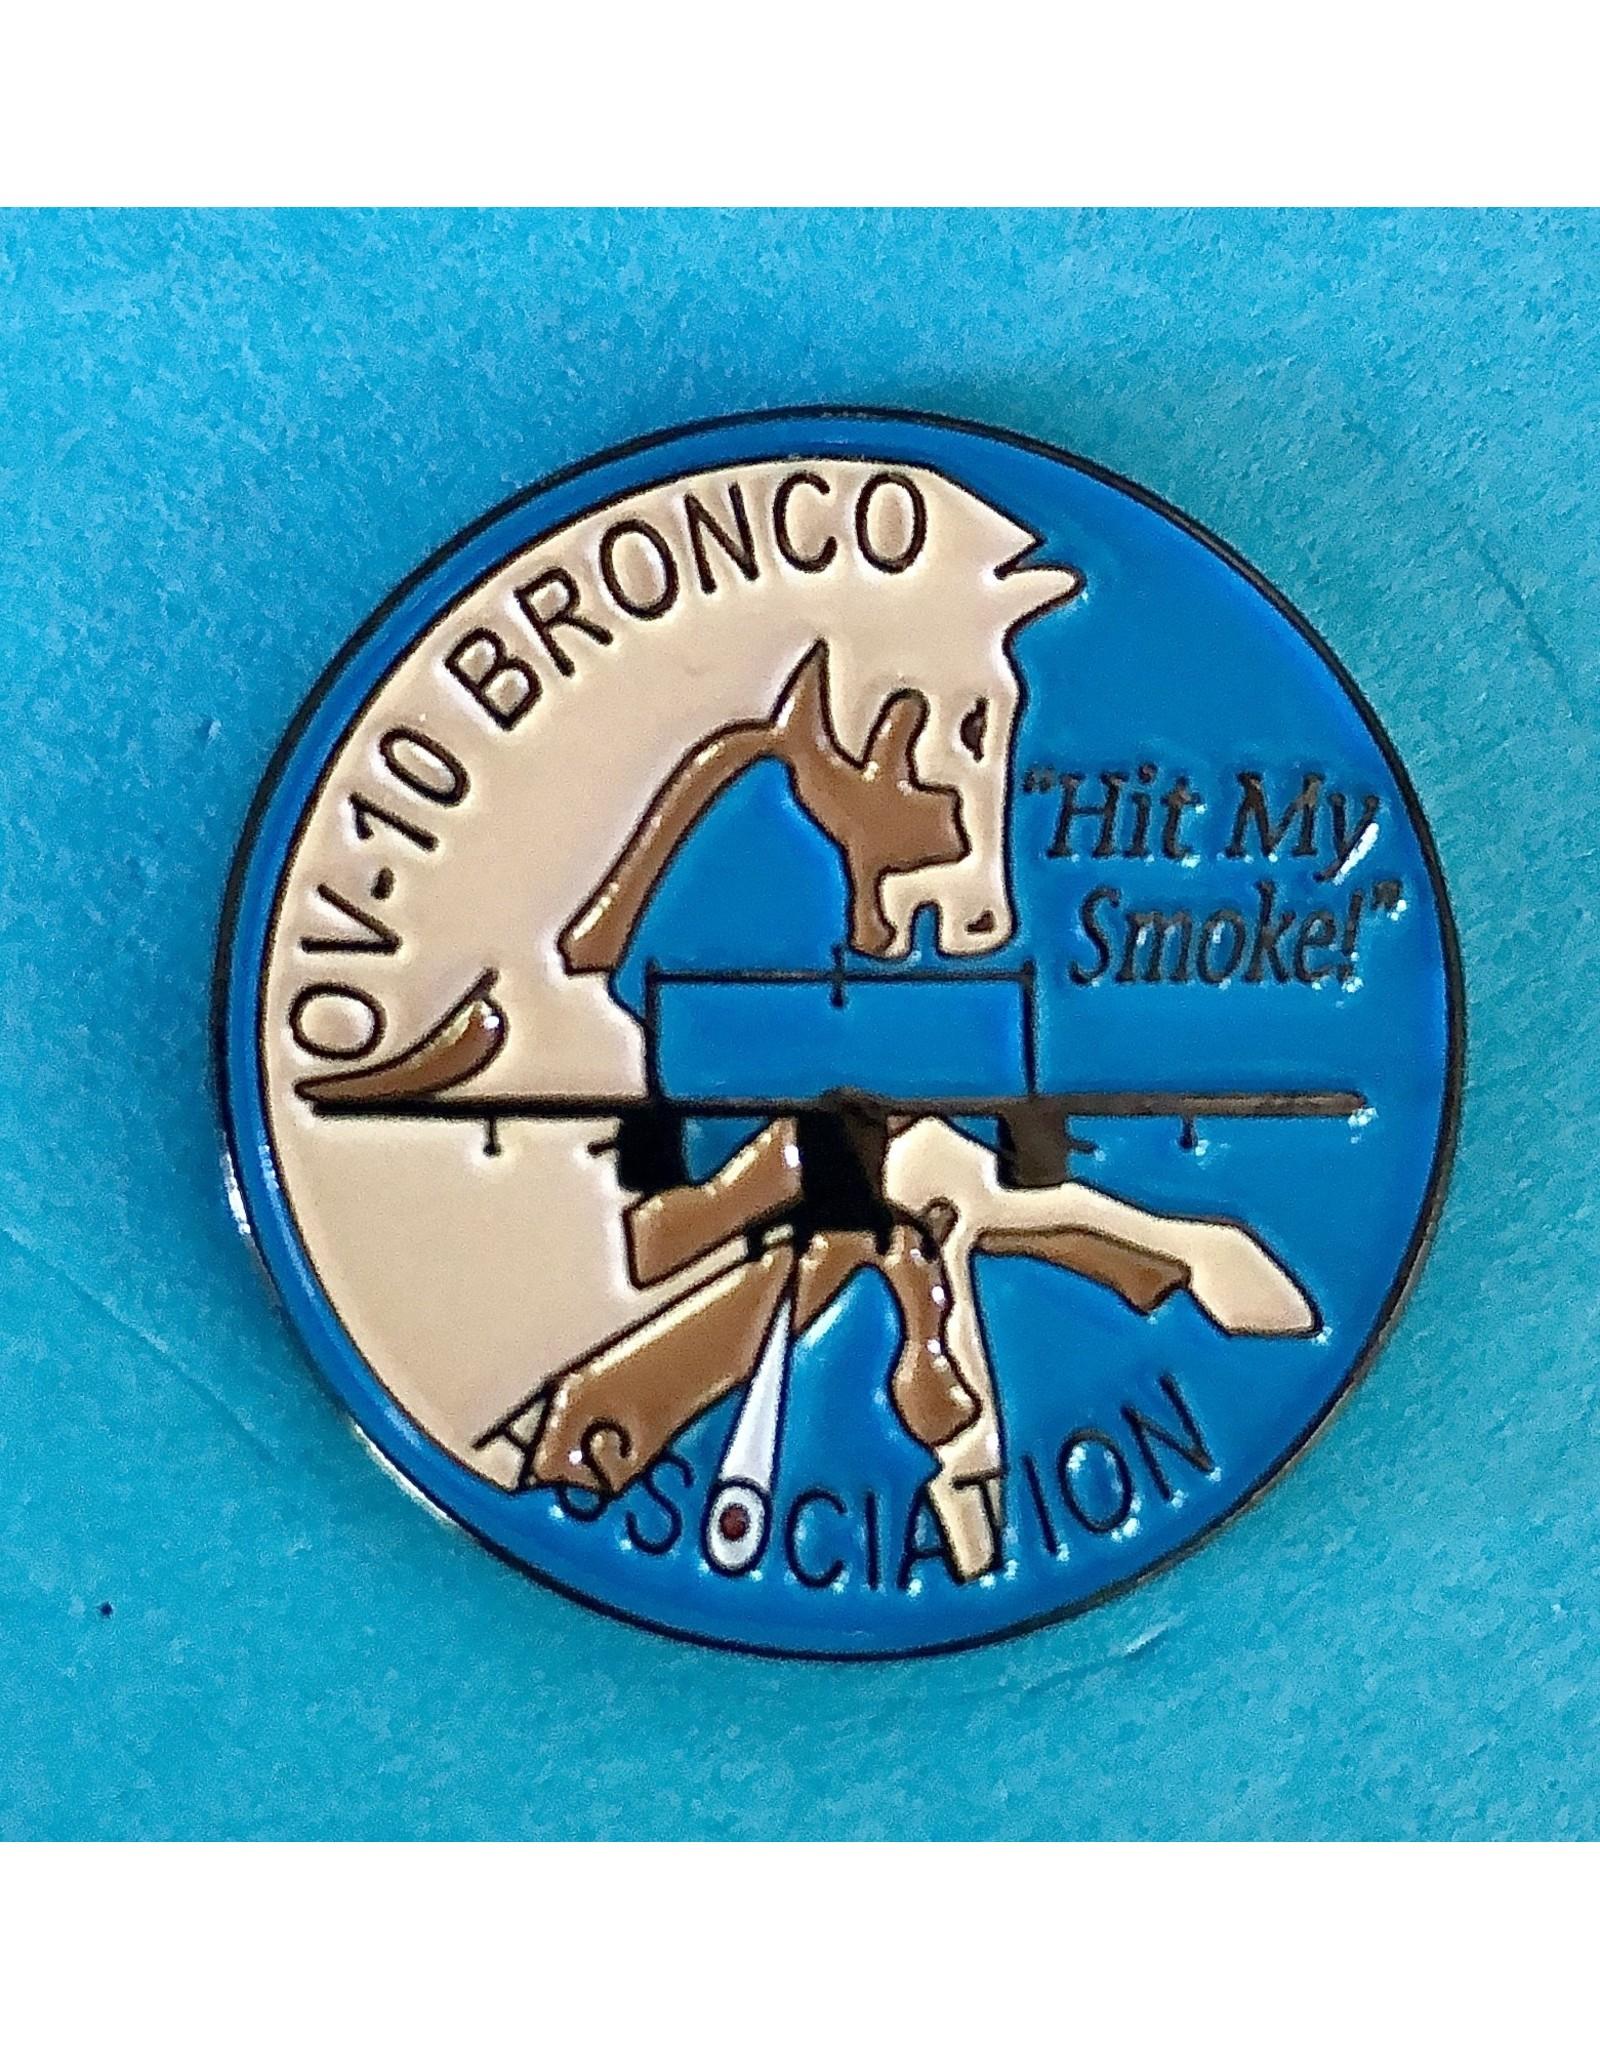 OBA OV-10 Bronco Assoc. Hit My Smoke Pin